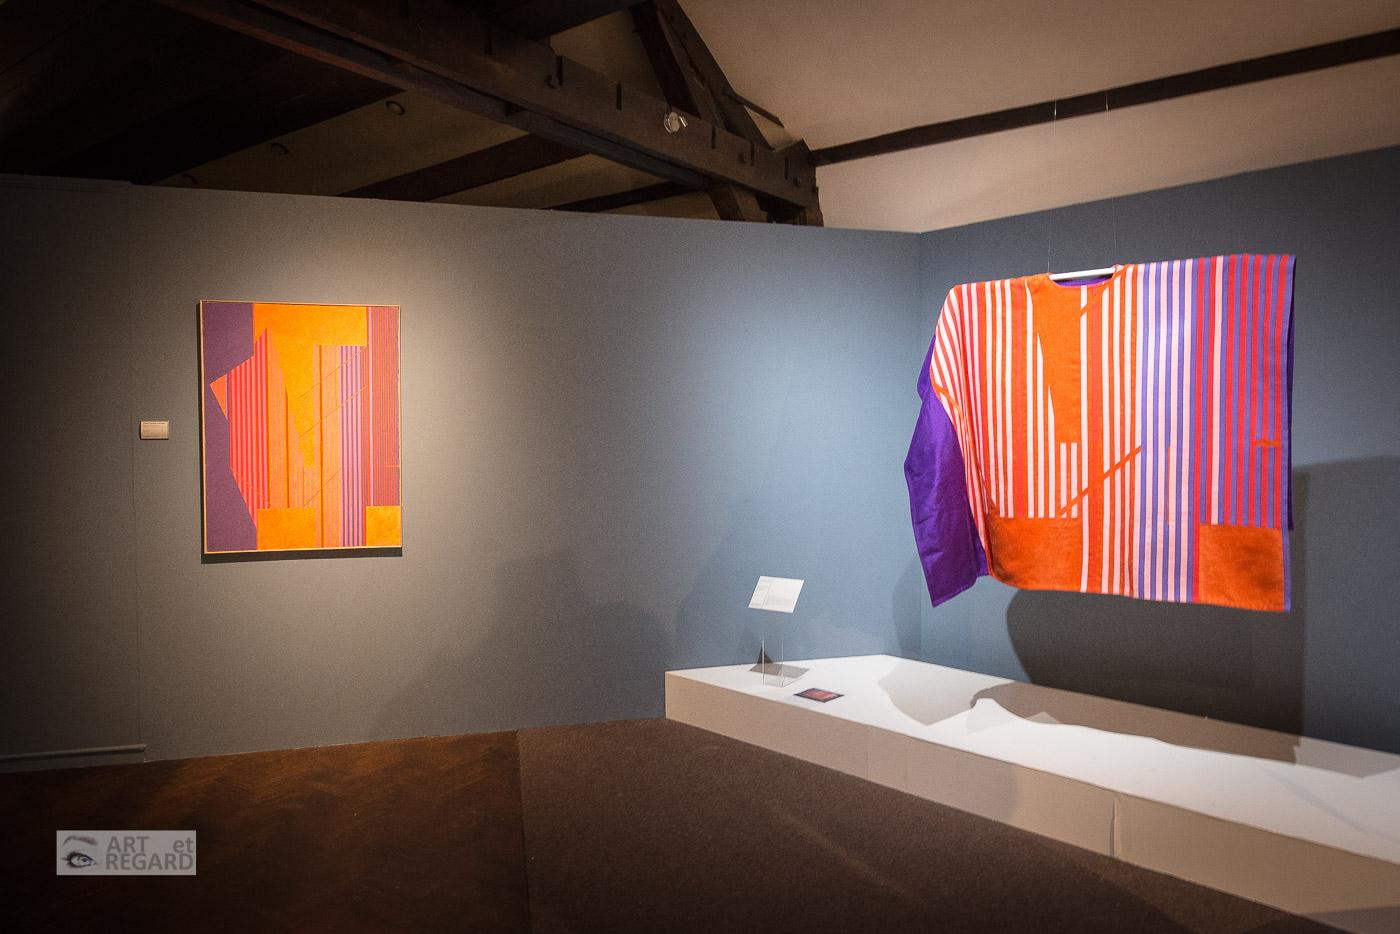 philippe deverdieu exposition caudry. Black Bedroom Furniture Sets. Home Design Ideas